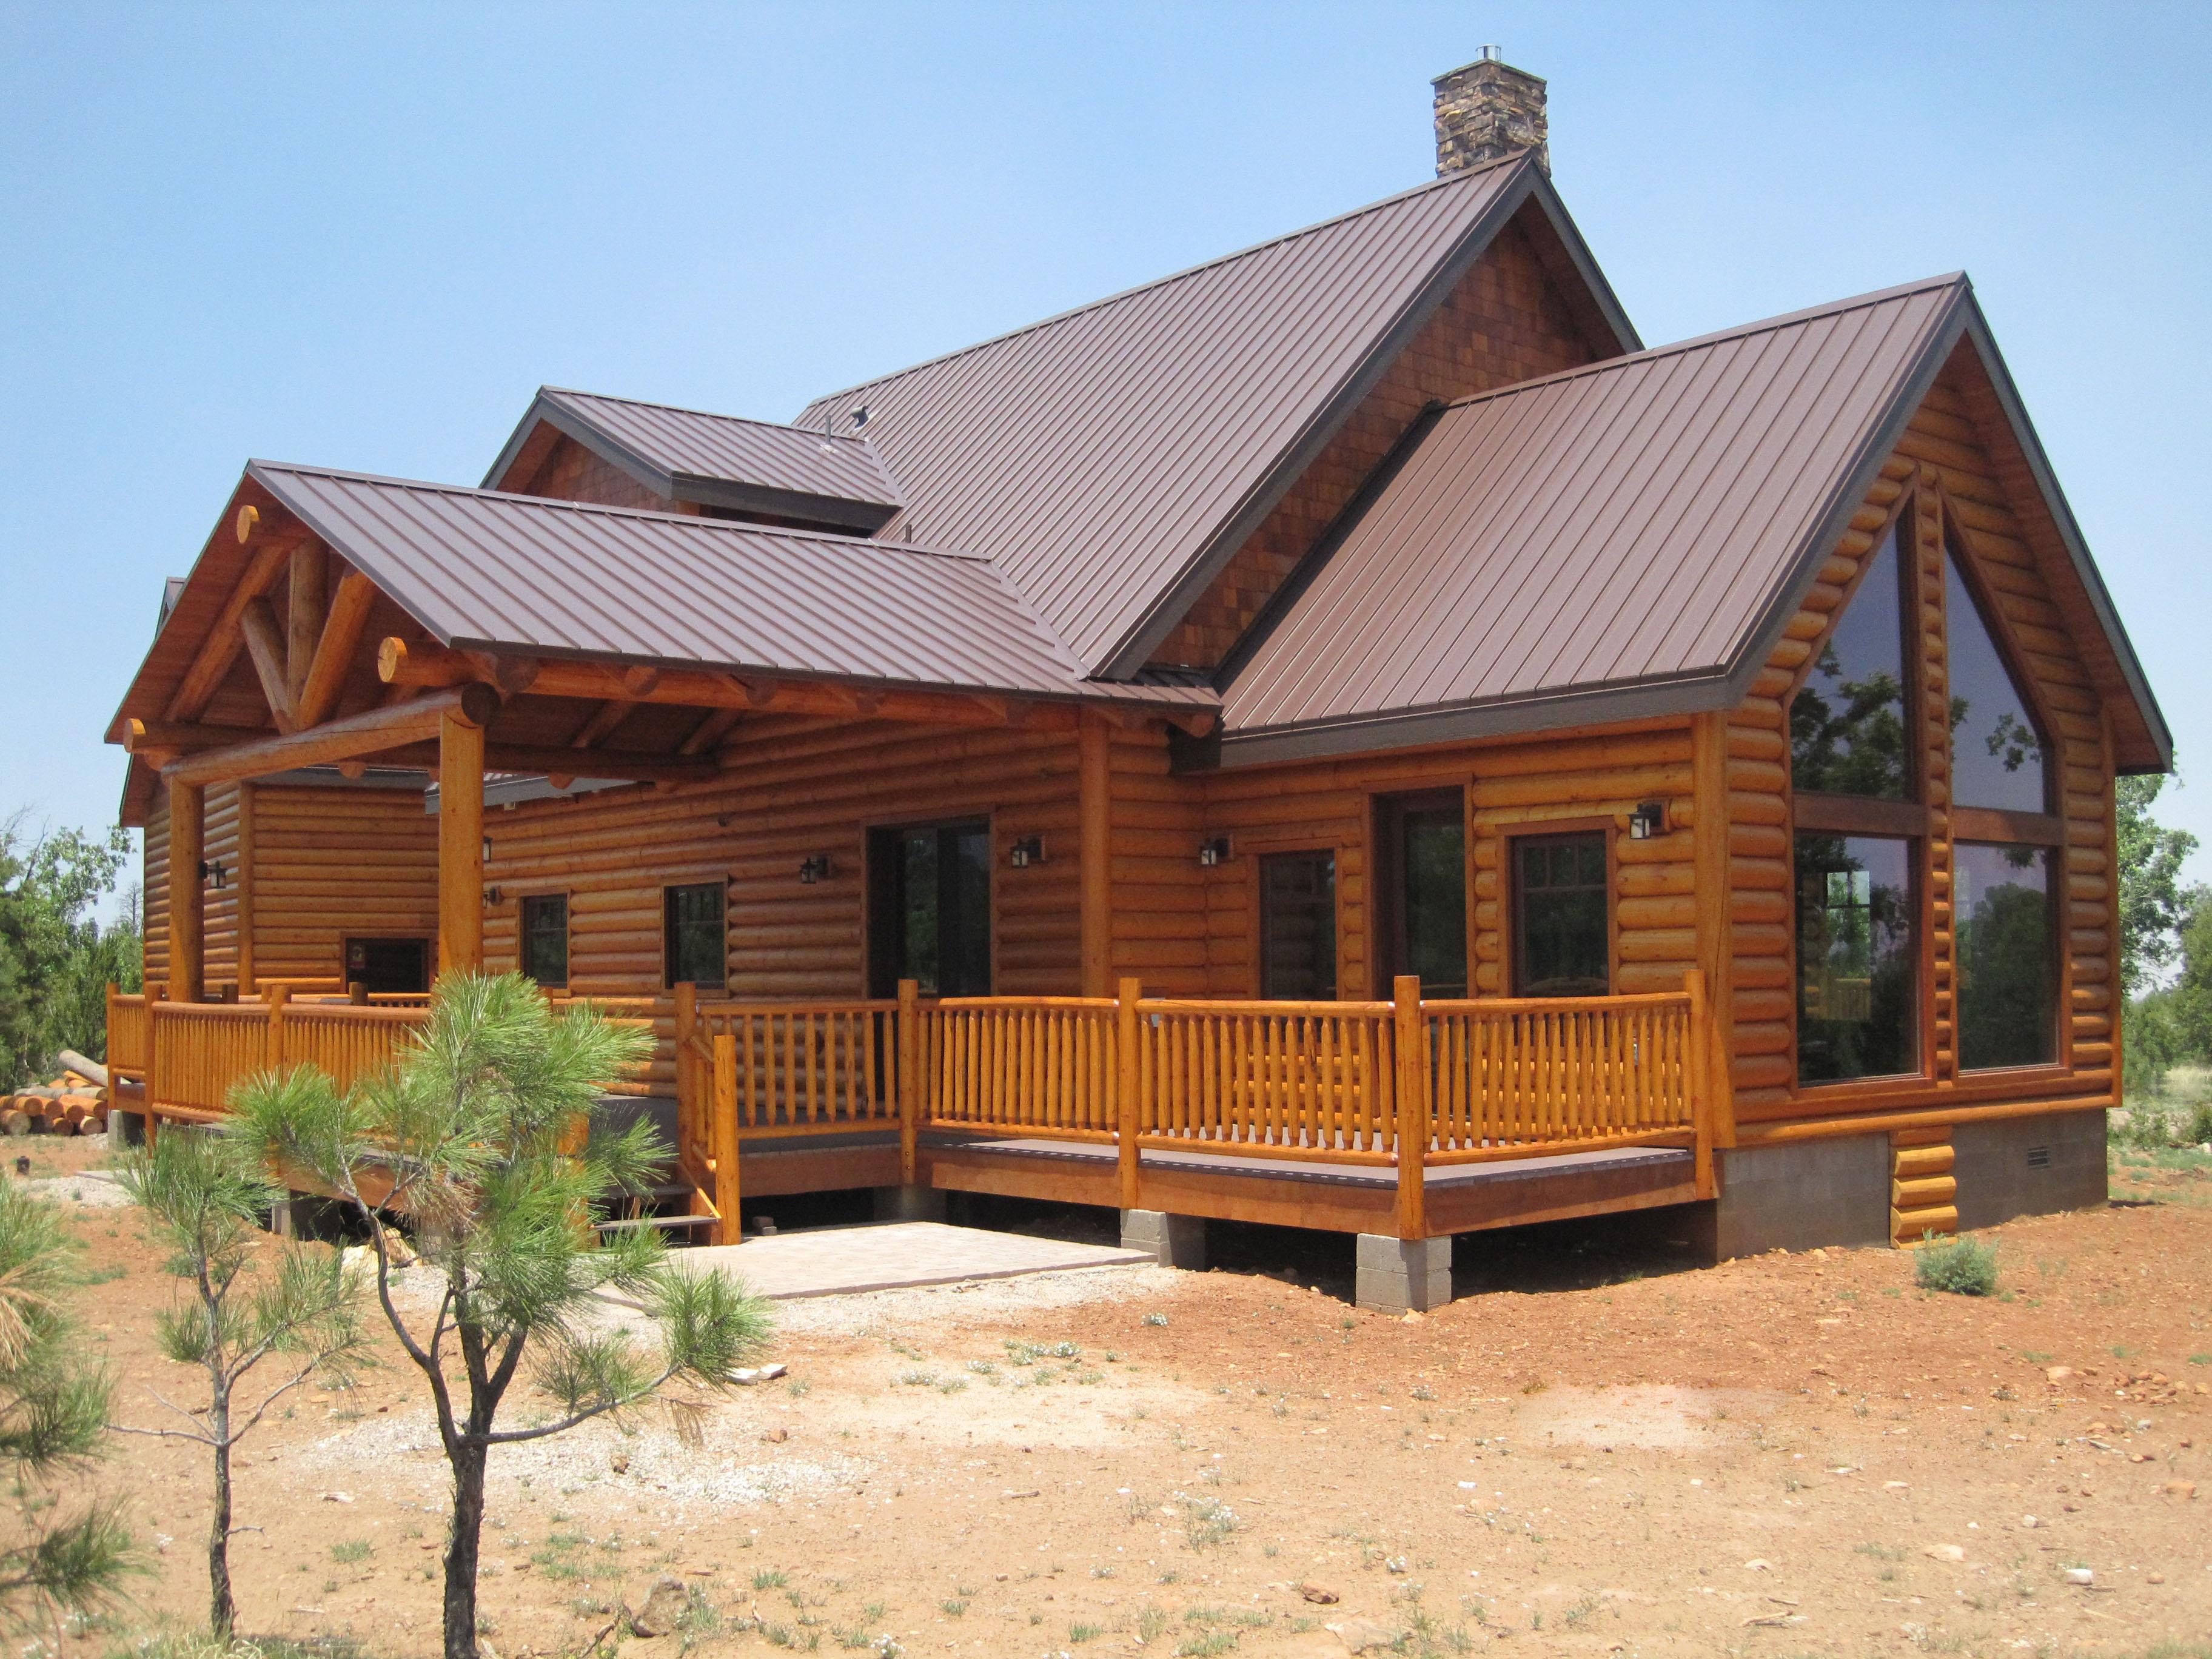 Cabin pictures 041. Avalon Log Homes s blog